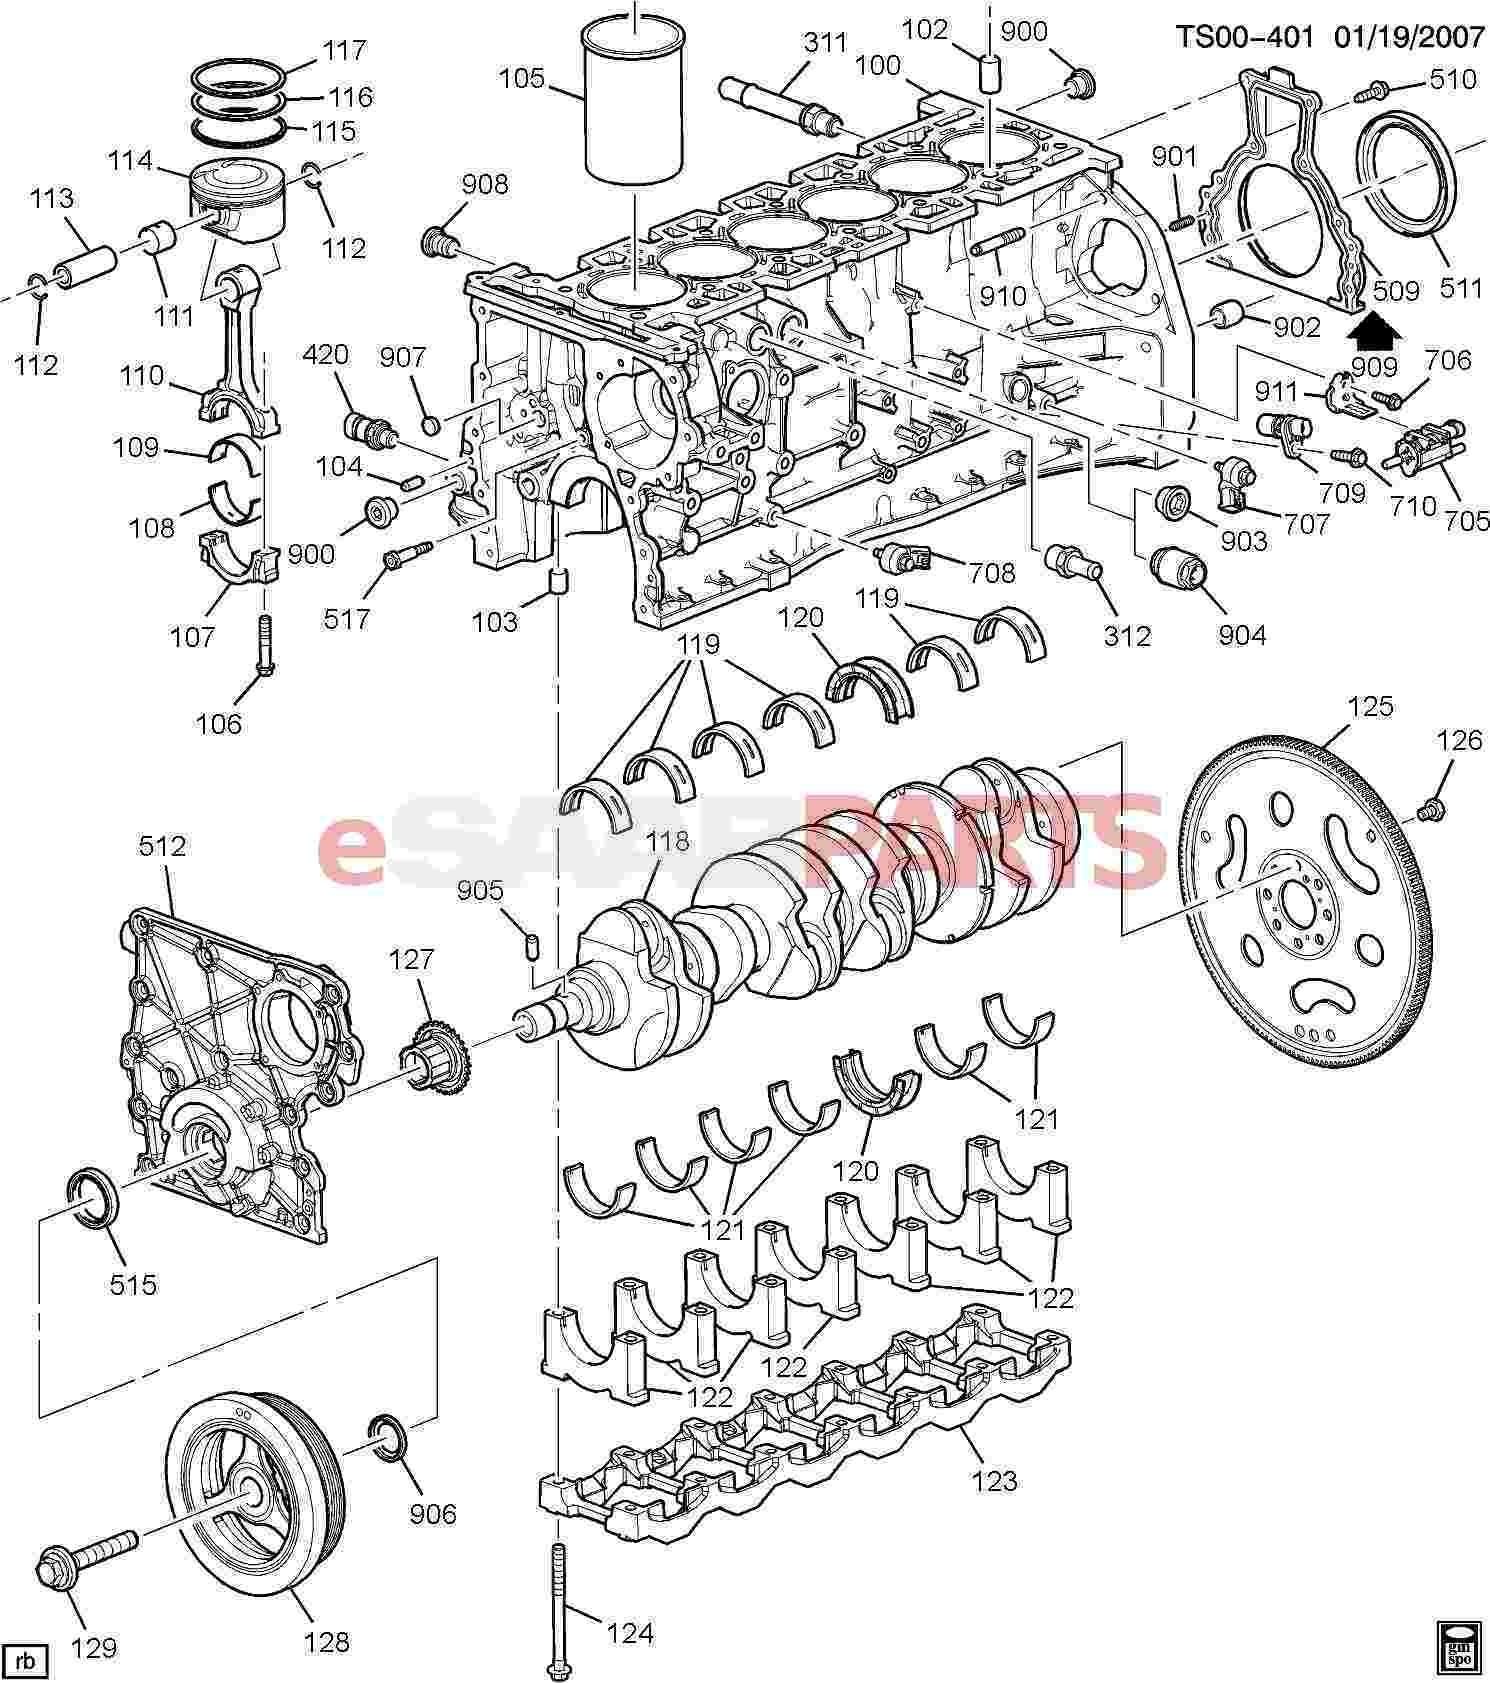 2003 Chevy Blazer Engine Diagram ] Saab Plug M16x1 5×14 24 Od society Automotive Of 2003 Chevy Blazer Engine Diagram